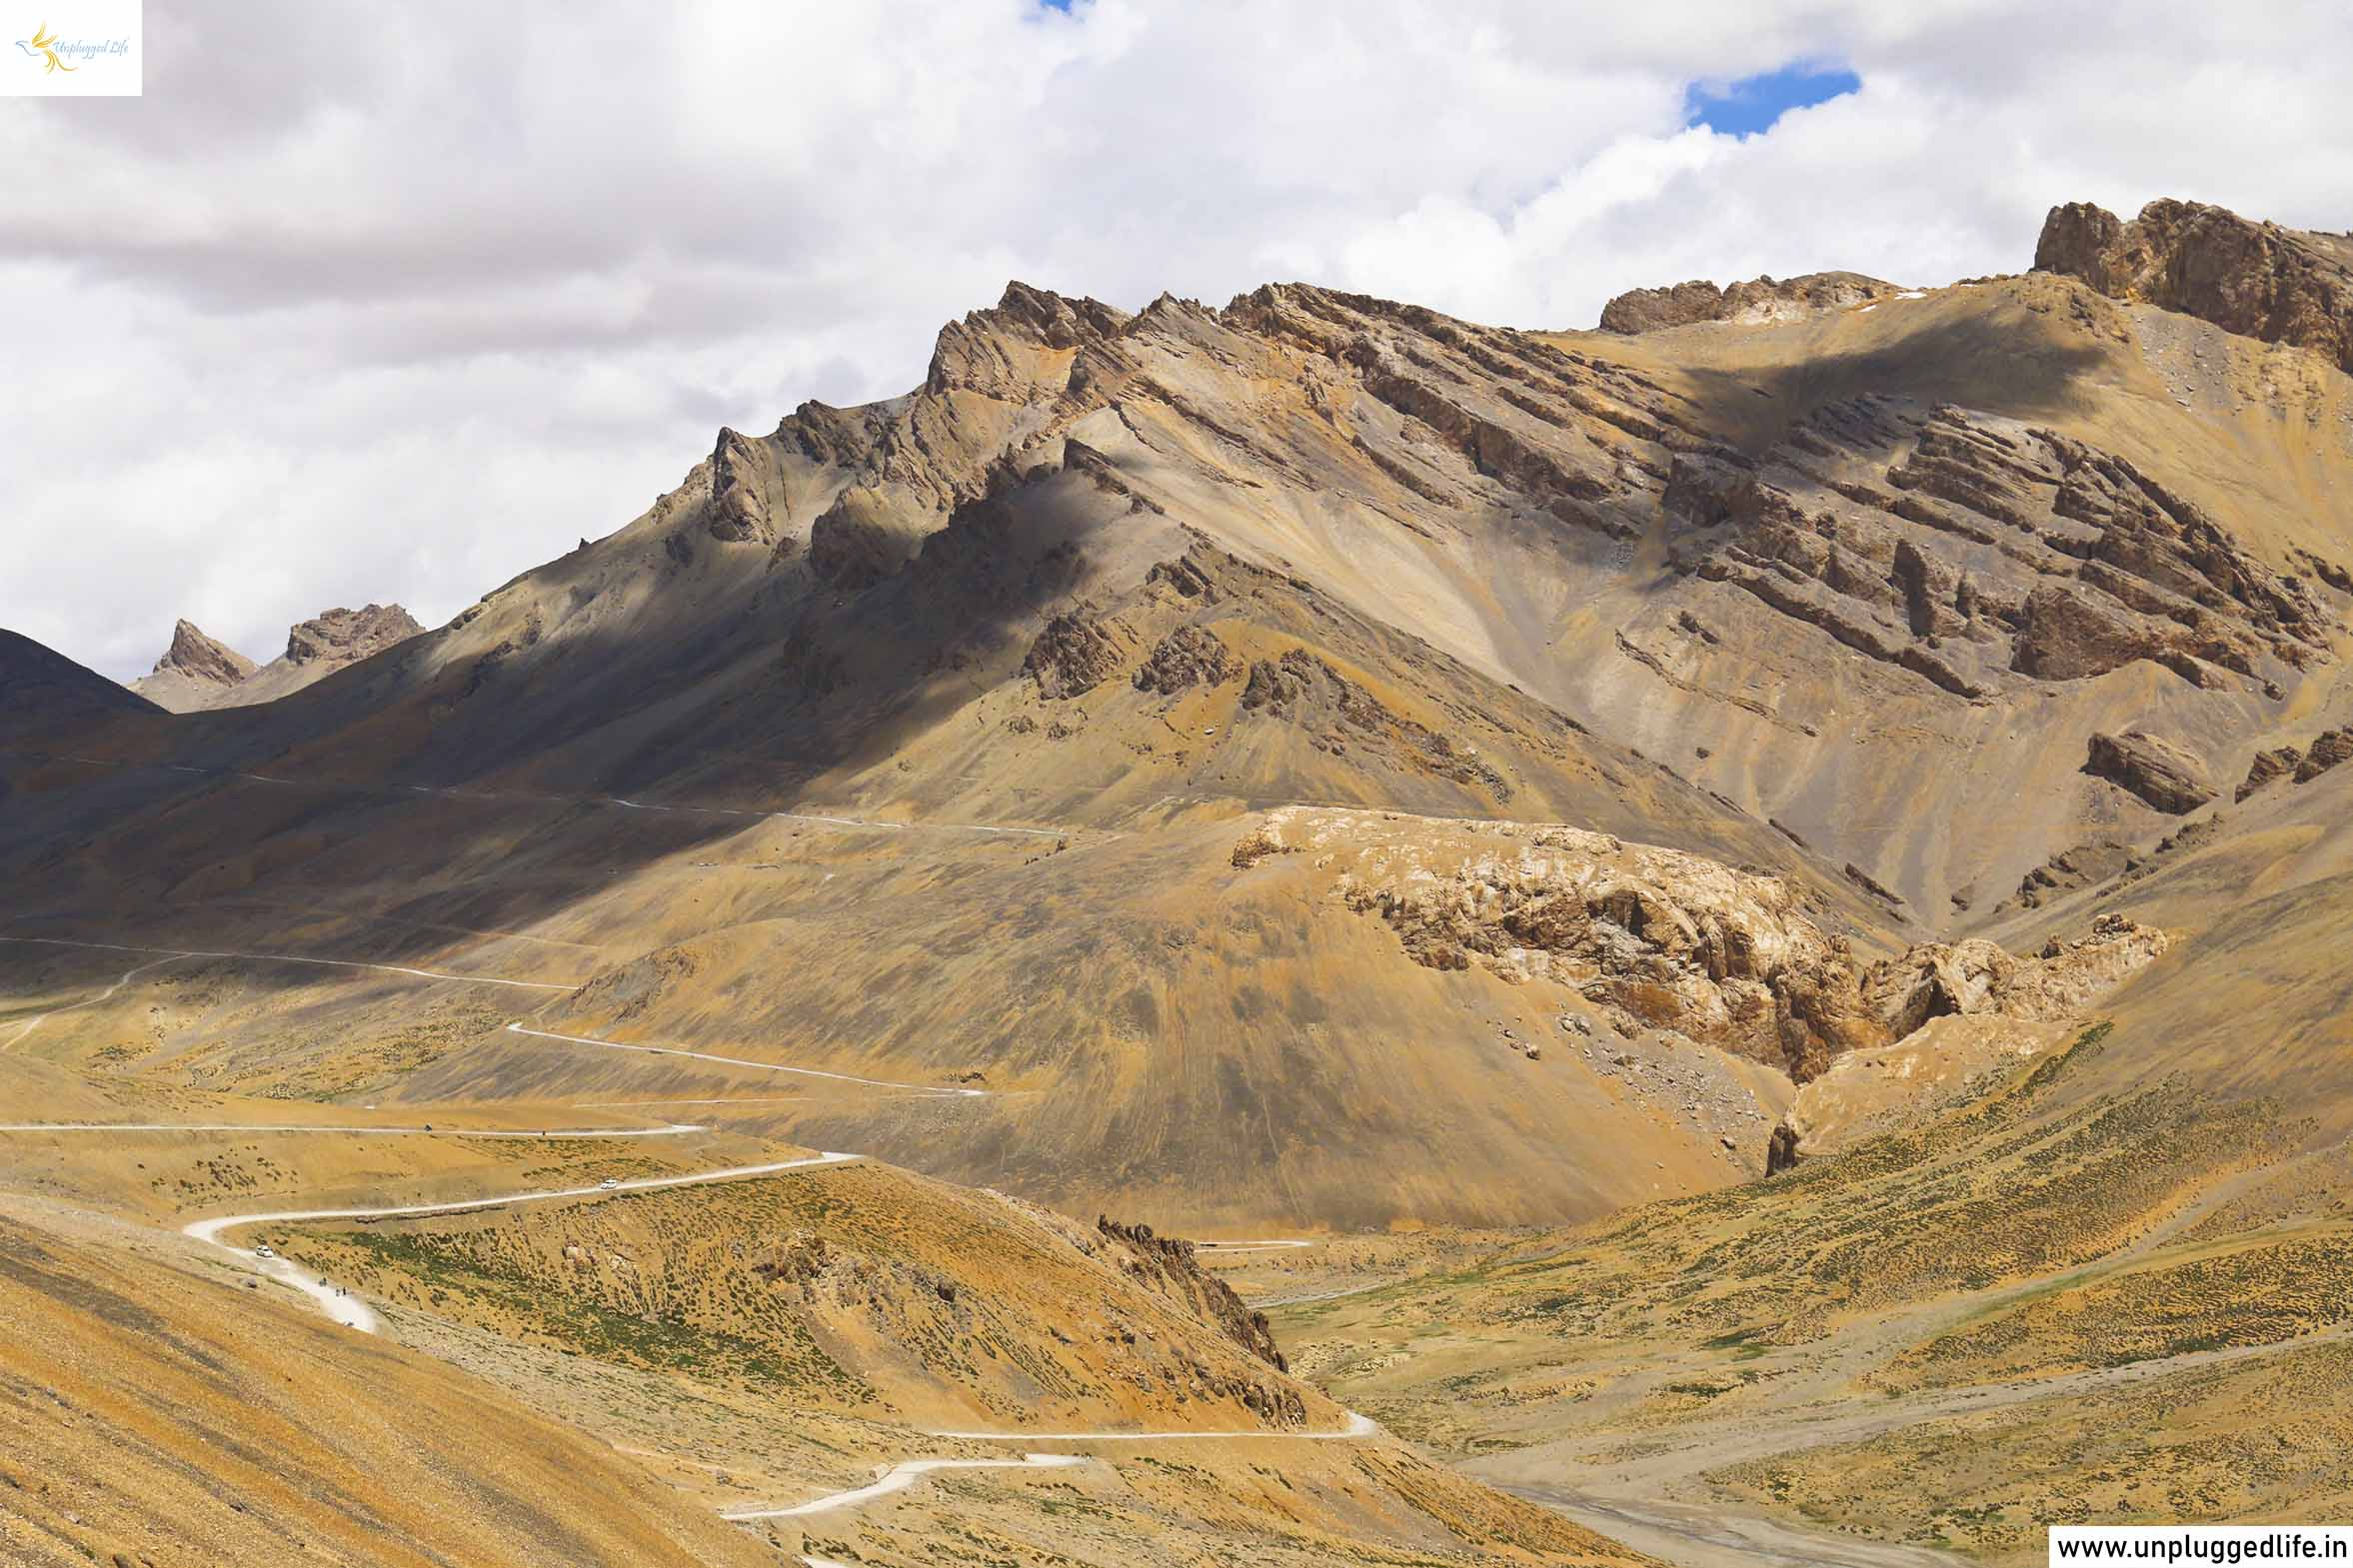 Ladakh, Keylong, Manali, Suraj Tal, Chandigarh to Manali, Manali to Leh Ladakh, Manali to Jispa, Himachal Pradesh, Himalayas, Manali to Keylong, Manali to Sarchu, Jispa to Sarchu, Keylong to Sarchu, Manali to Rohtang Pass, Chandigarh to Leh Ladakh, Ladakh by Road, Ladakh Overland, Drive to Leh Ladakh, Leh Ladakh Tour Package, Ladakh Tour, Mountain View, View of Himalaya, Nakee La Pass, Manali to Leh Highway, Leh to Manali Highway